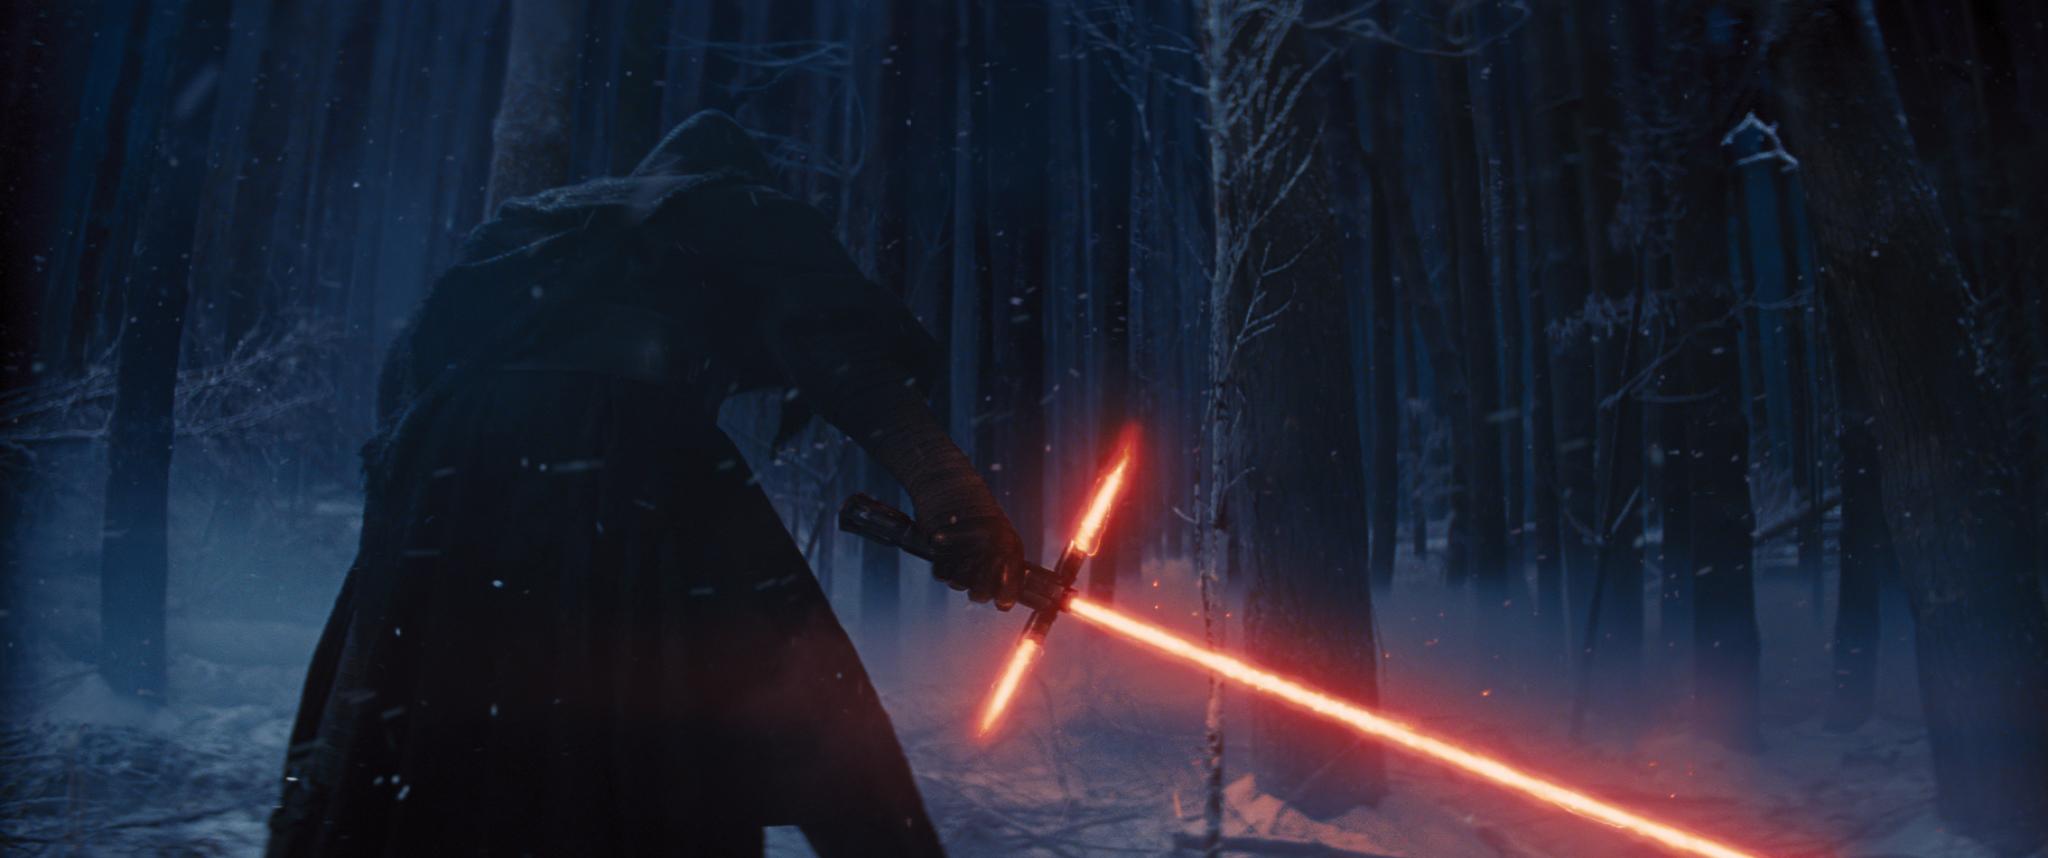 Watch 'Star Wars: The Force Awakens' Teaser Trailer